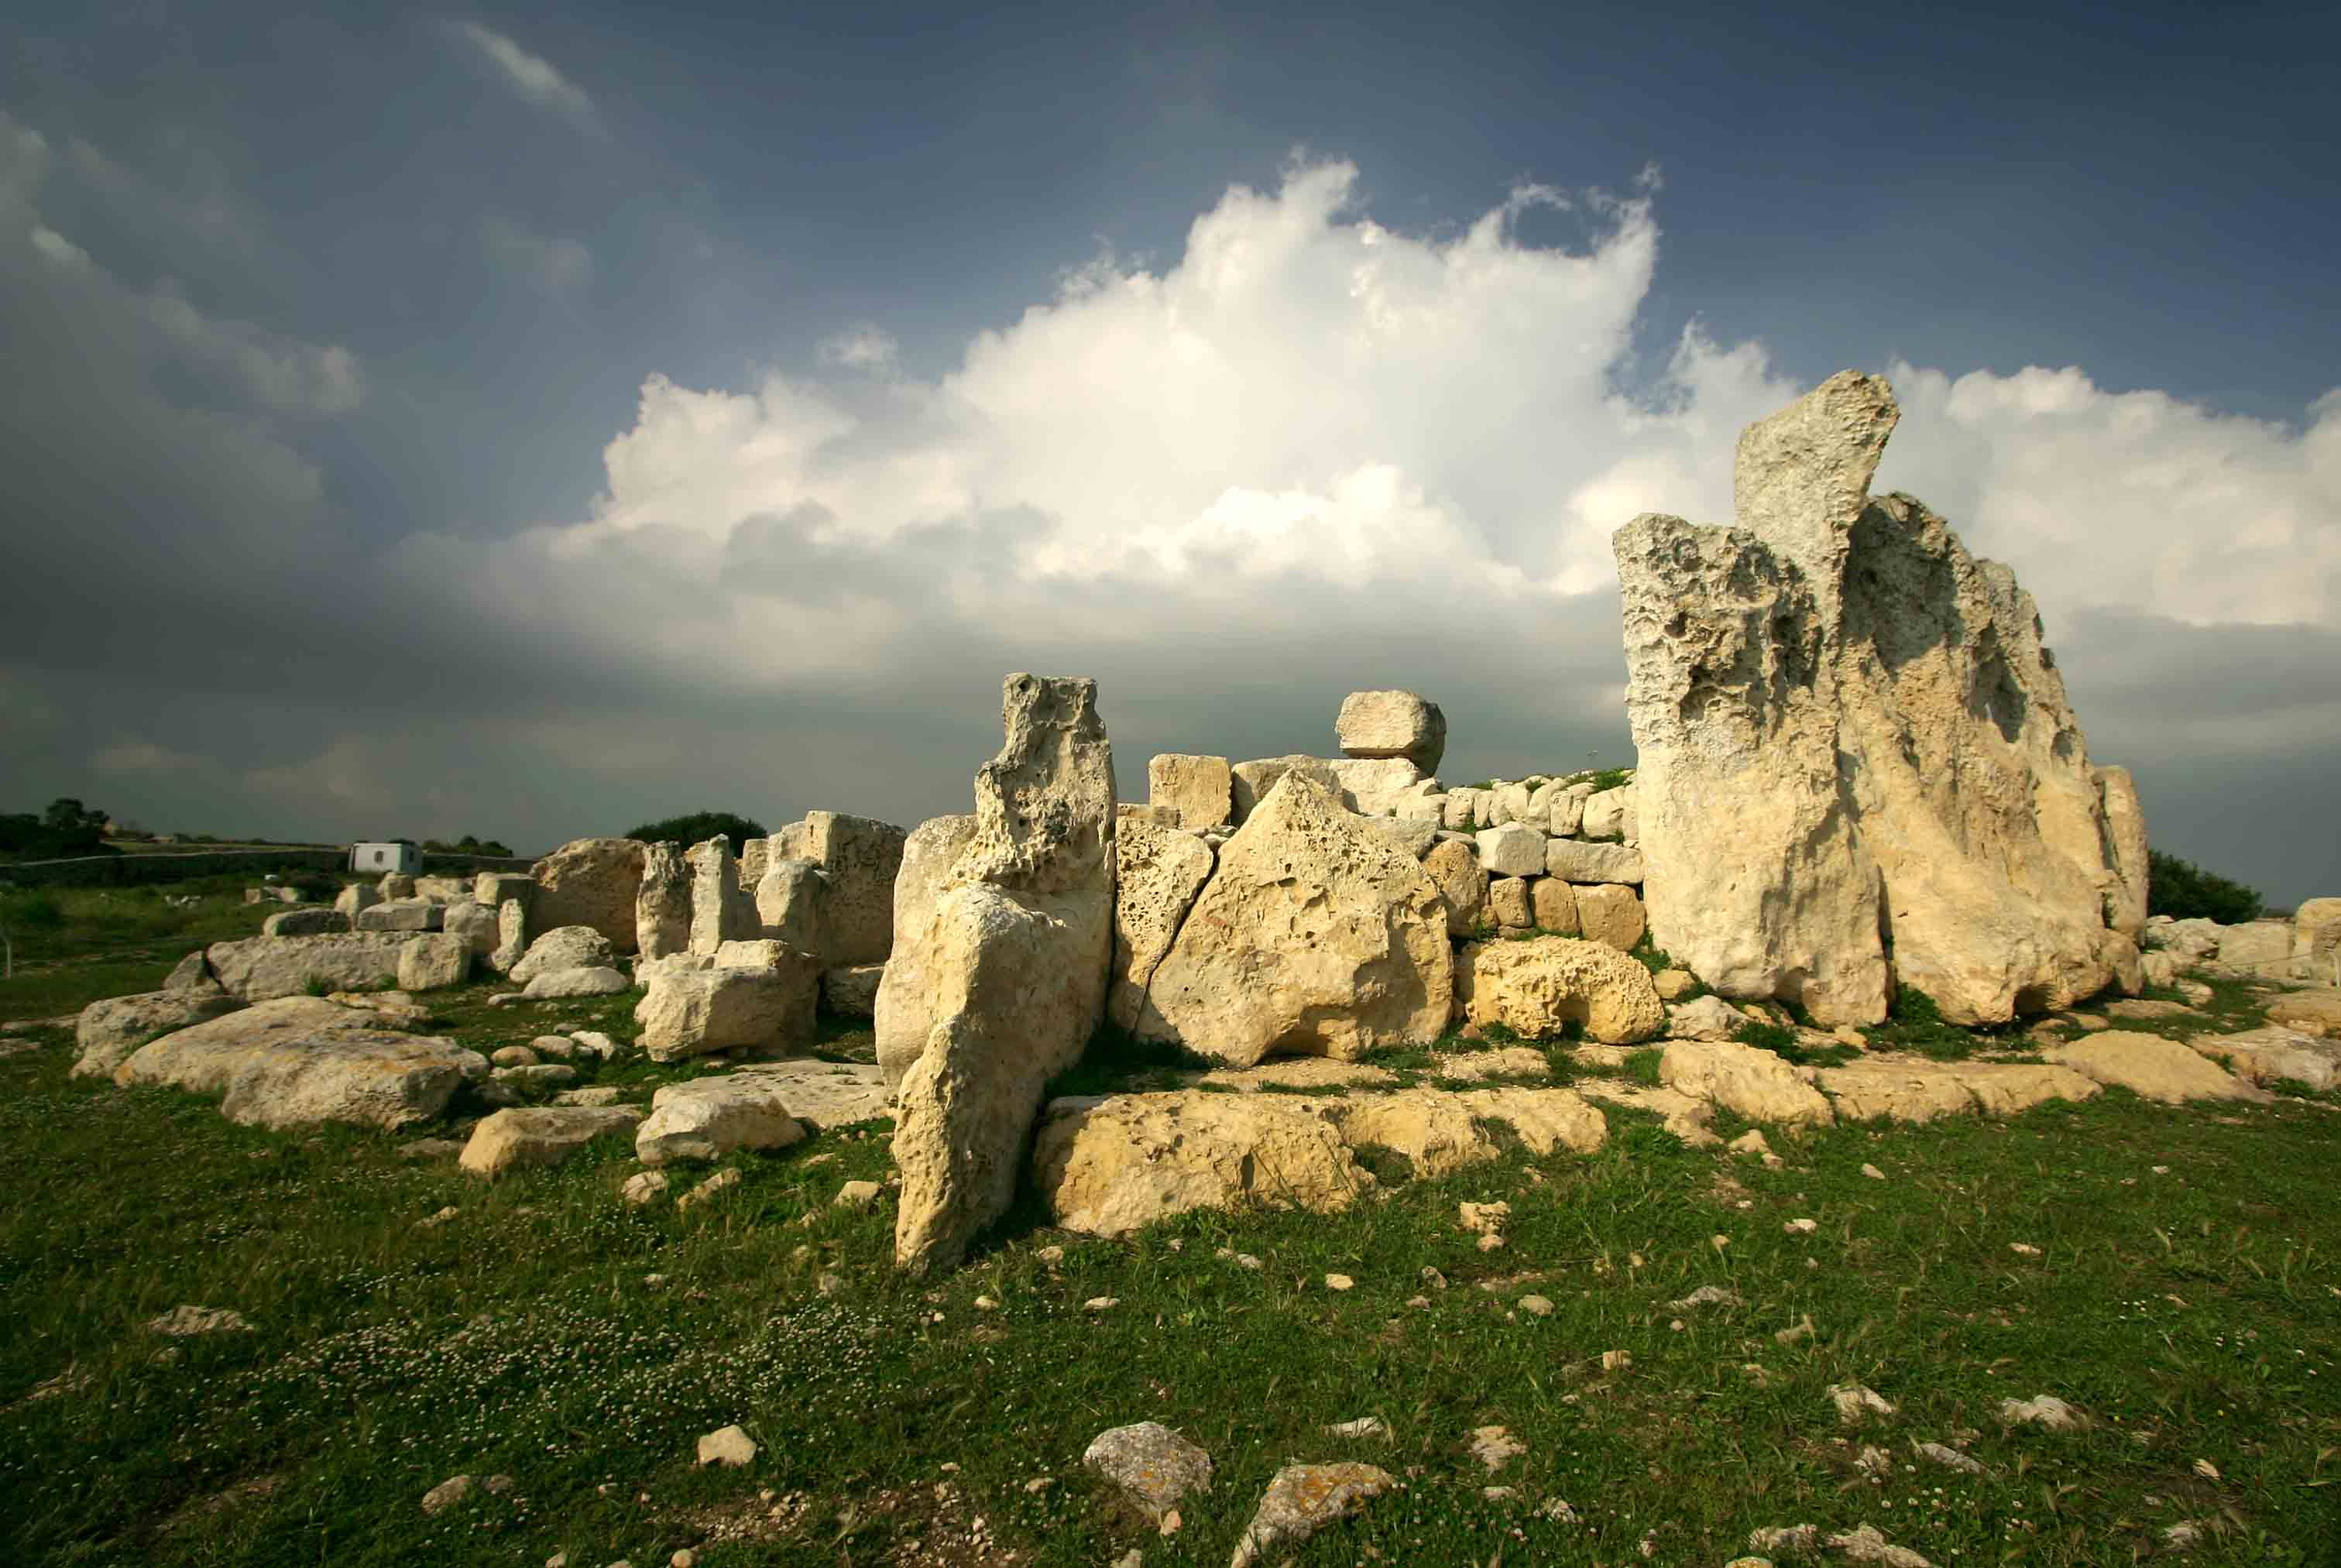 The Temple at Hagar Qim